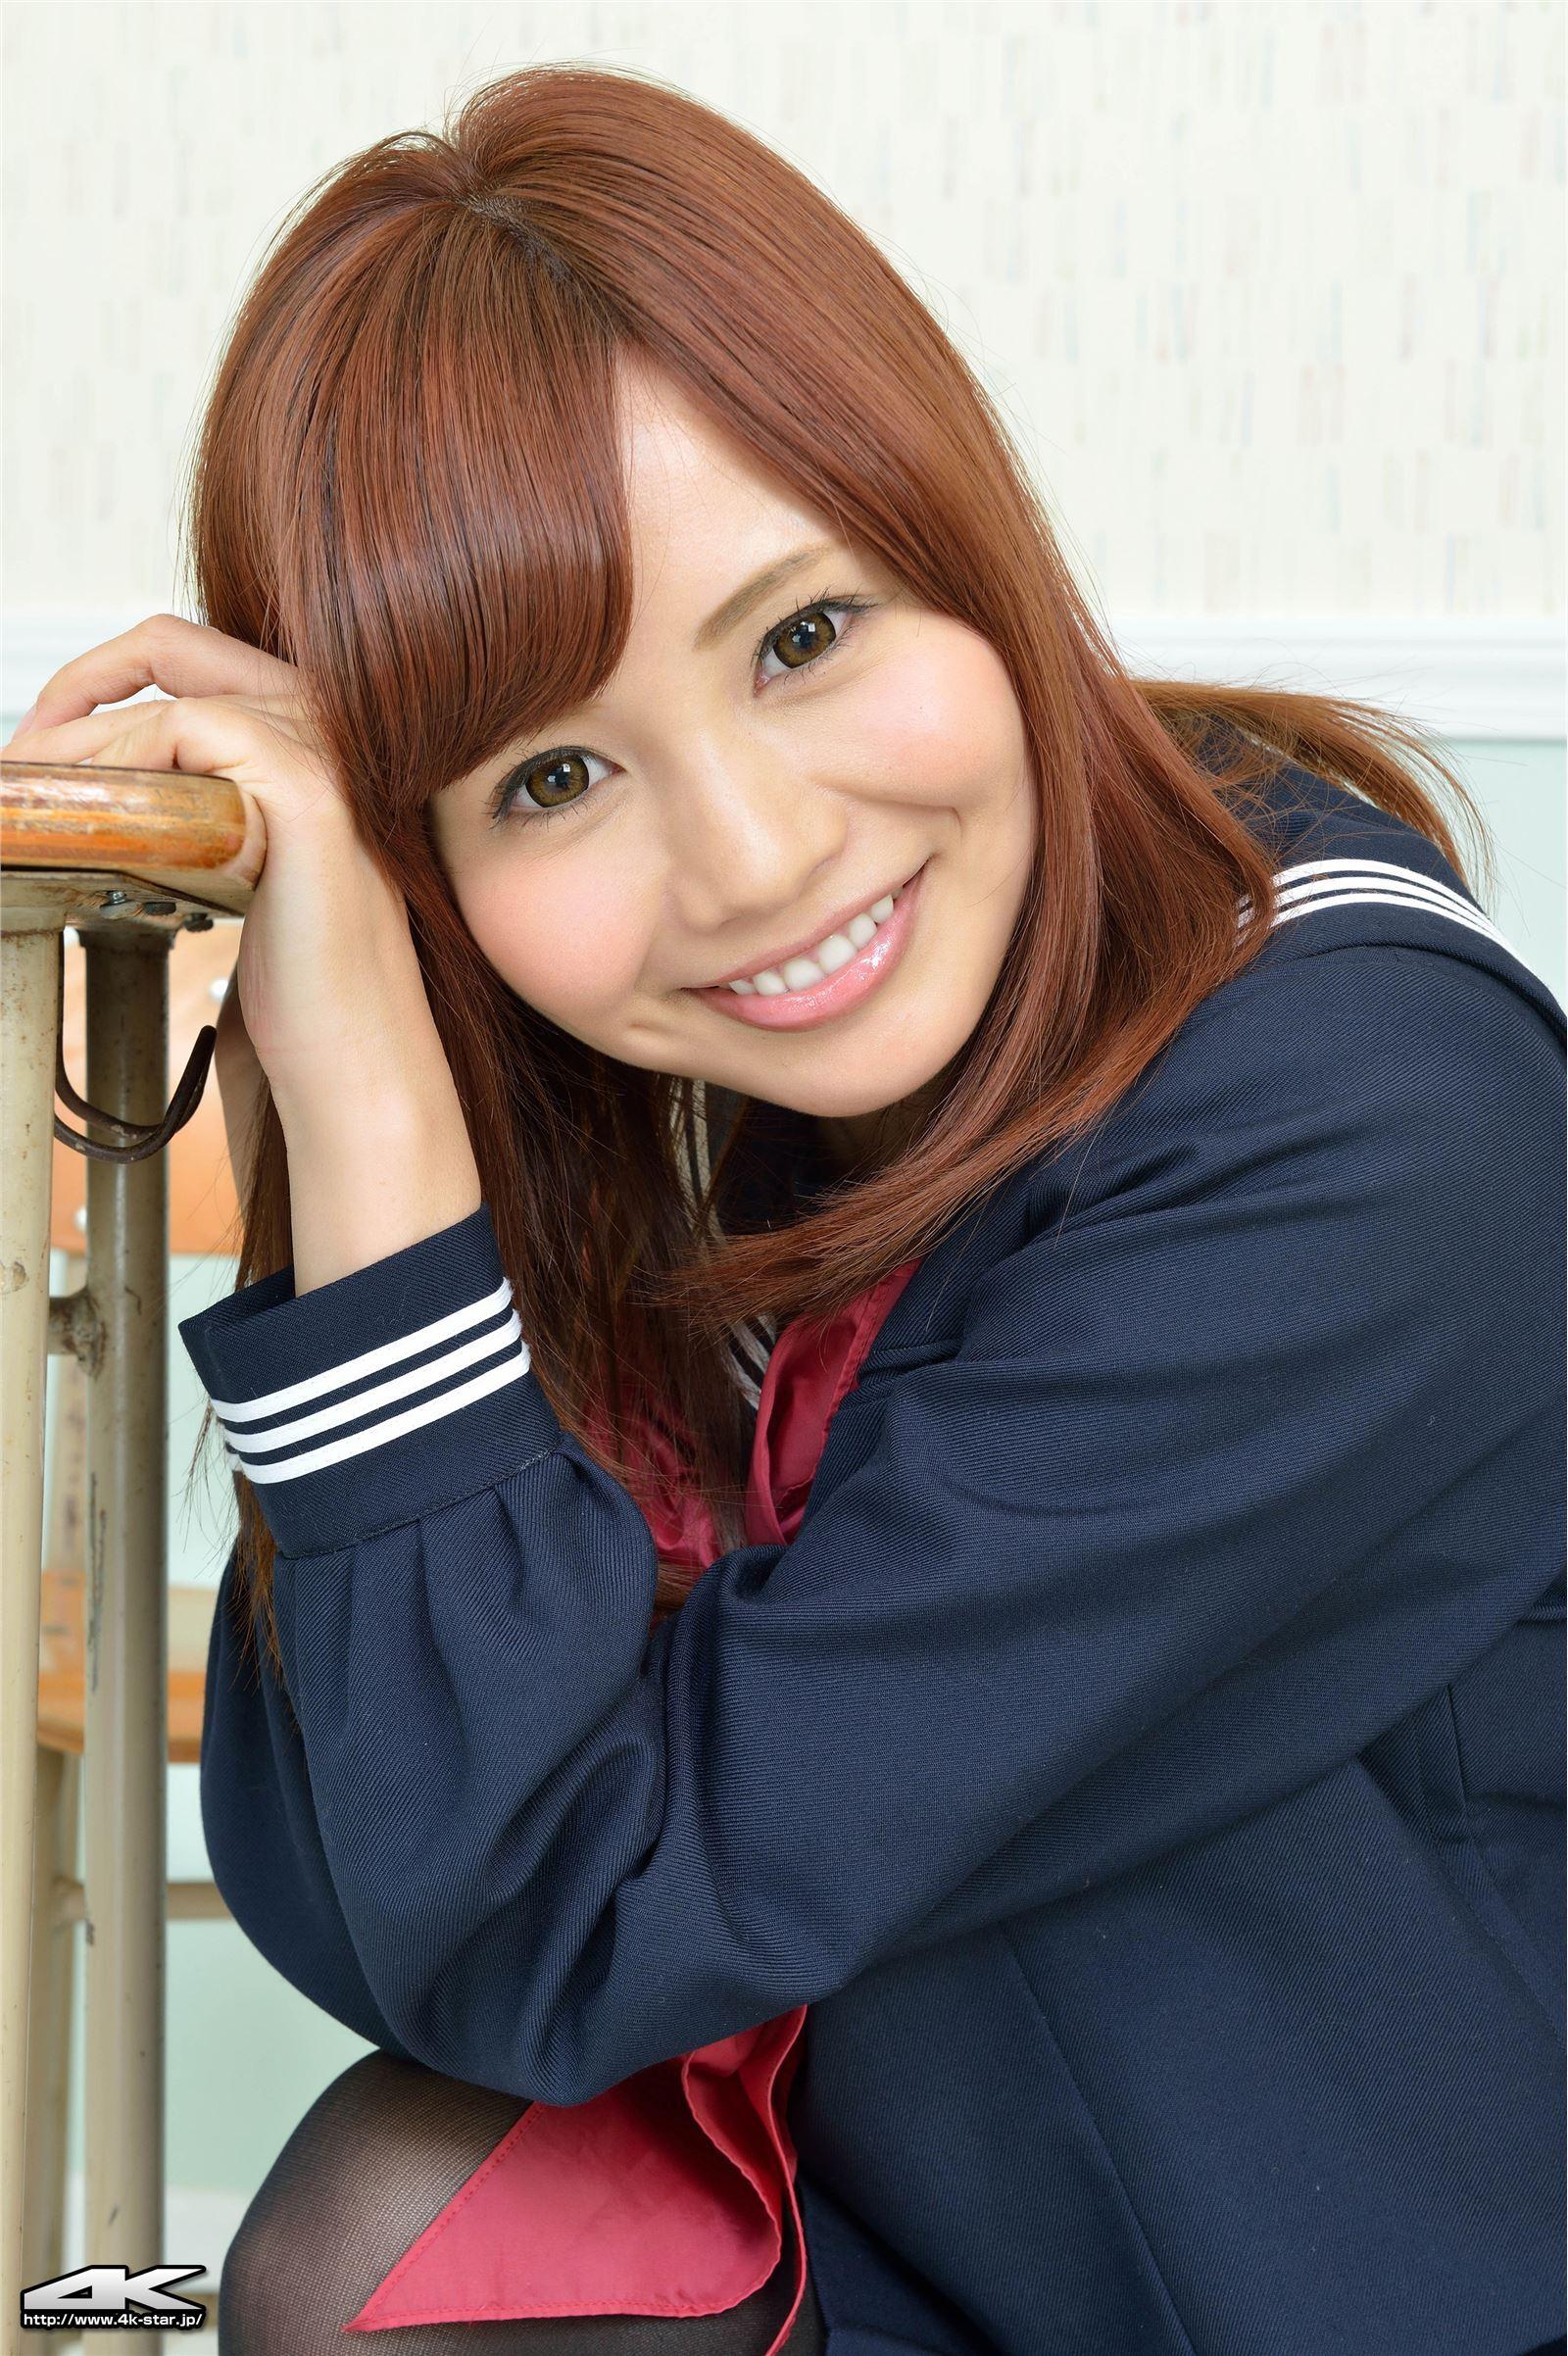 4K-STAR 2016.07.13 NO.624 Ando Chihiro SchoolGirl